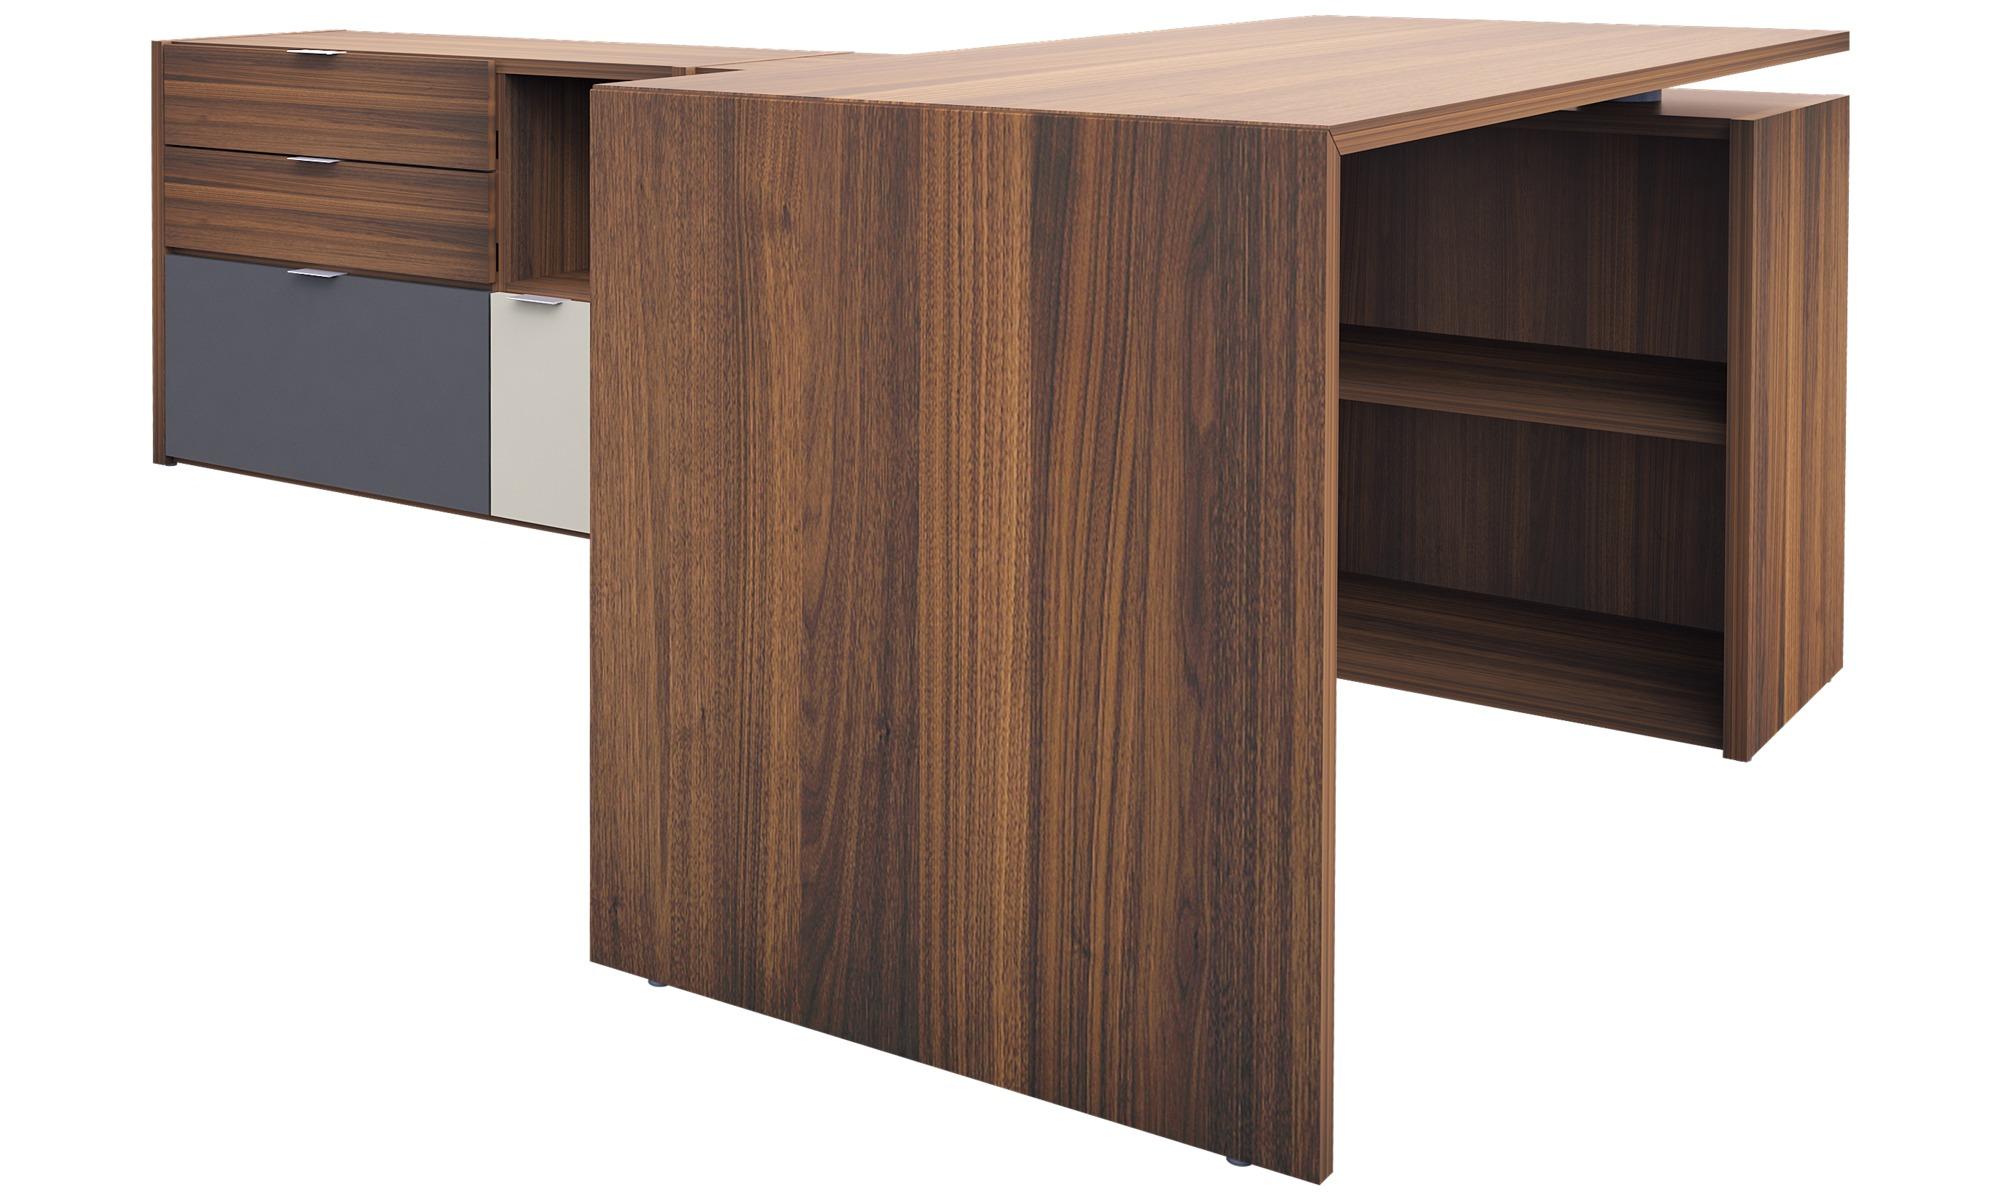 Desks Copenhagen Office System Brown Walnut